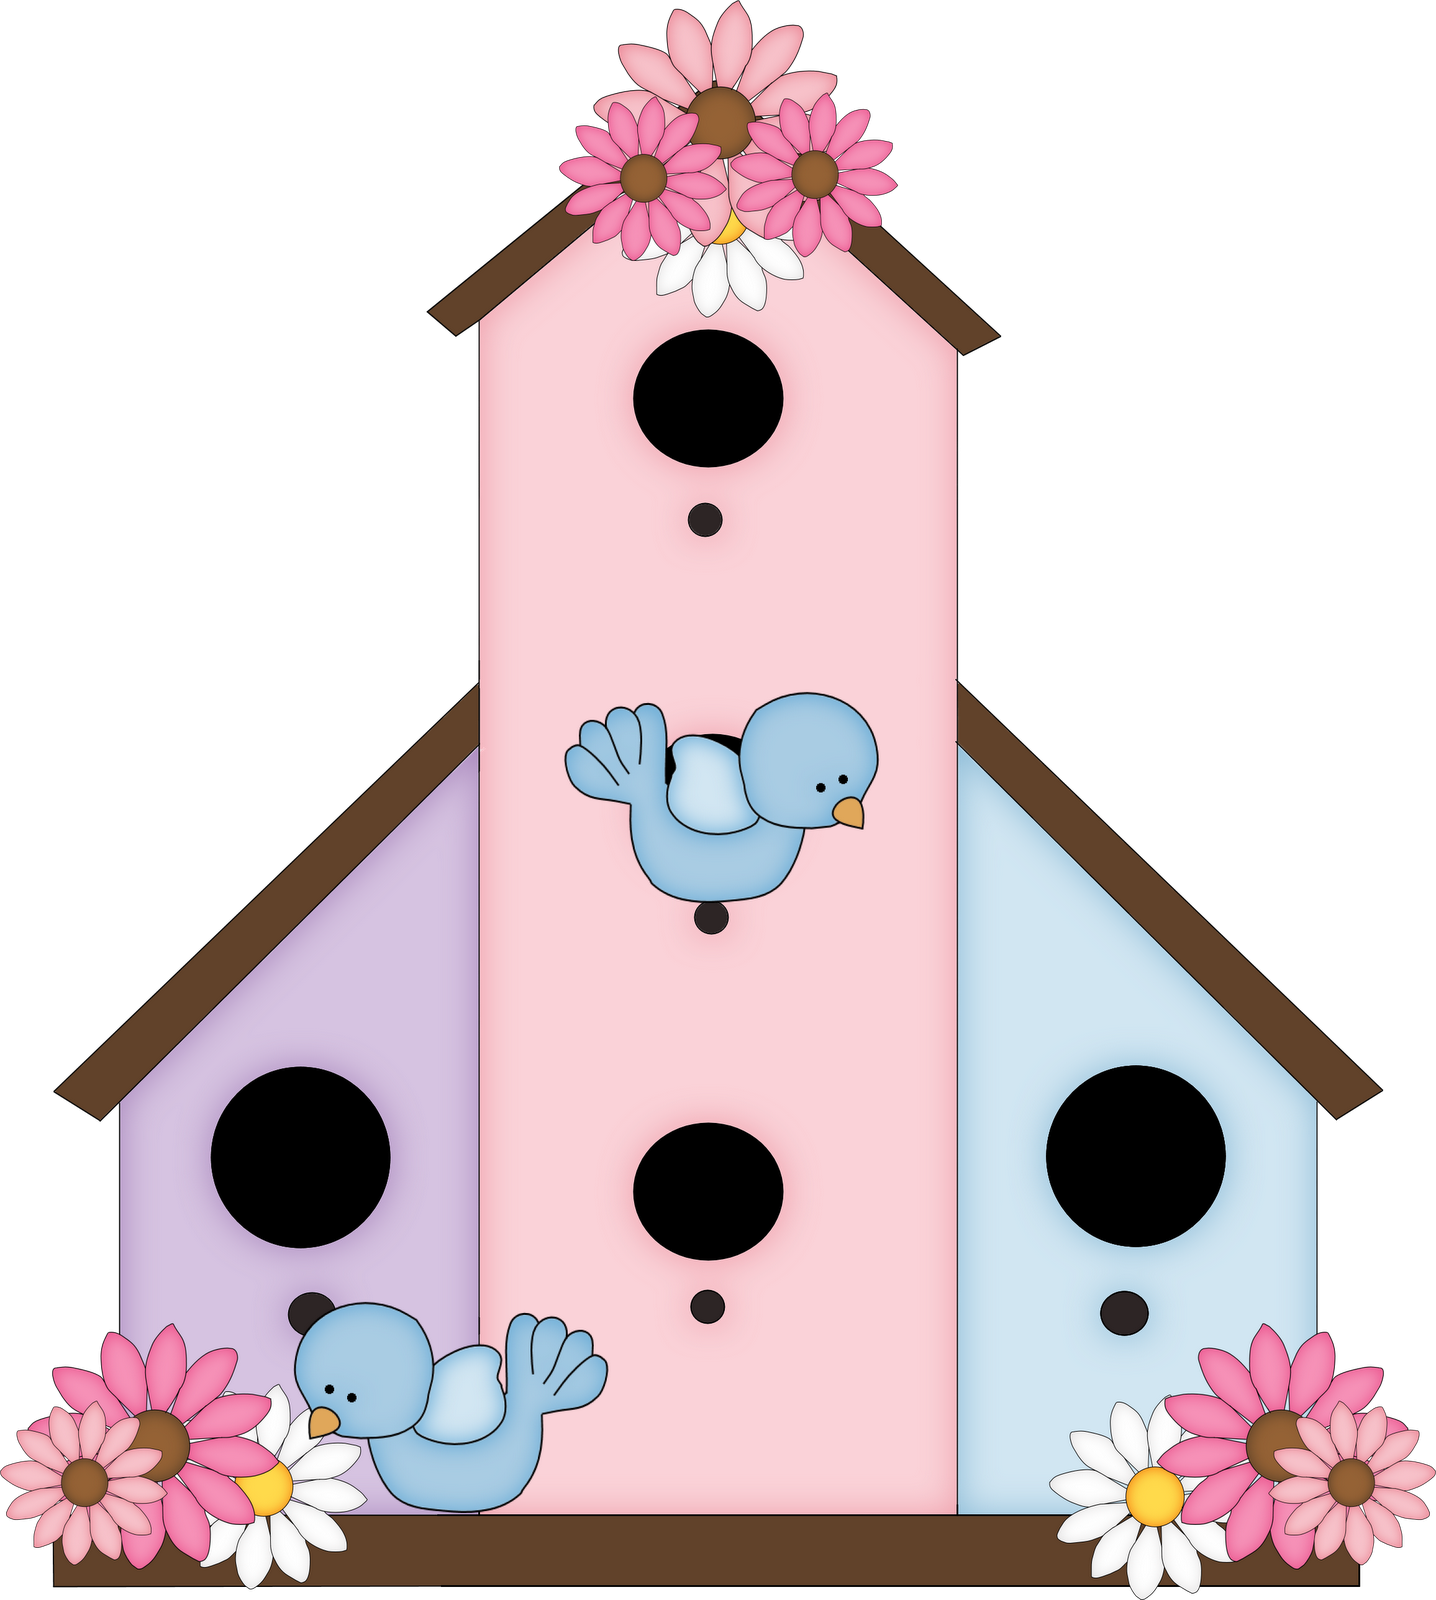 Free Birdhouse Cliparts, Download Free Clip Art, Free Clip.